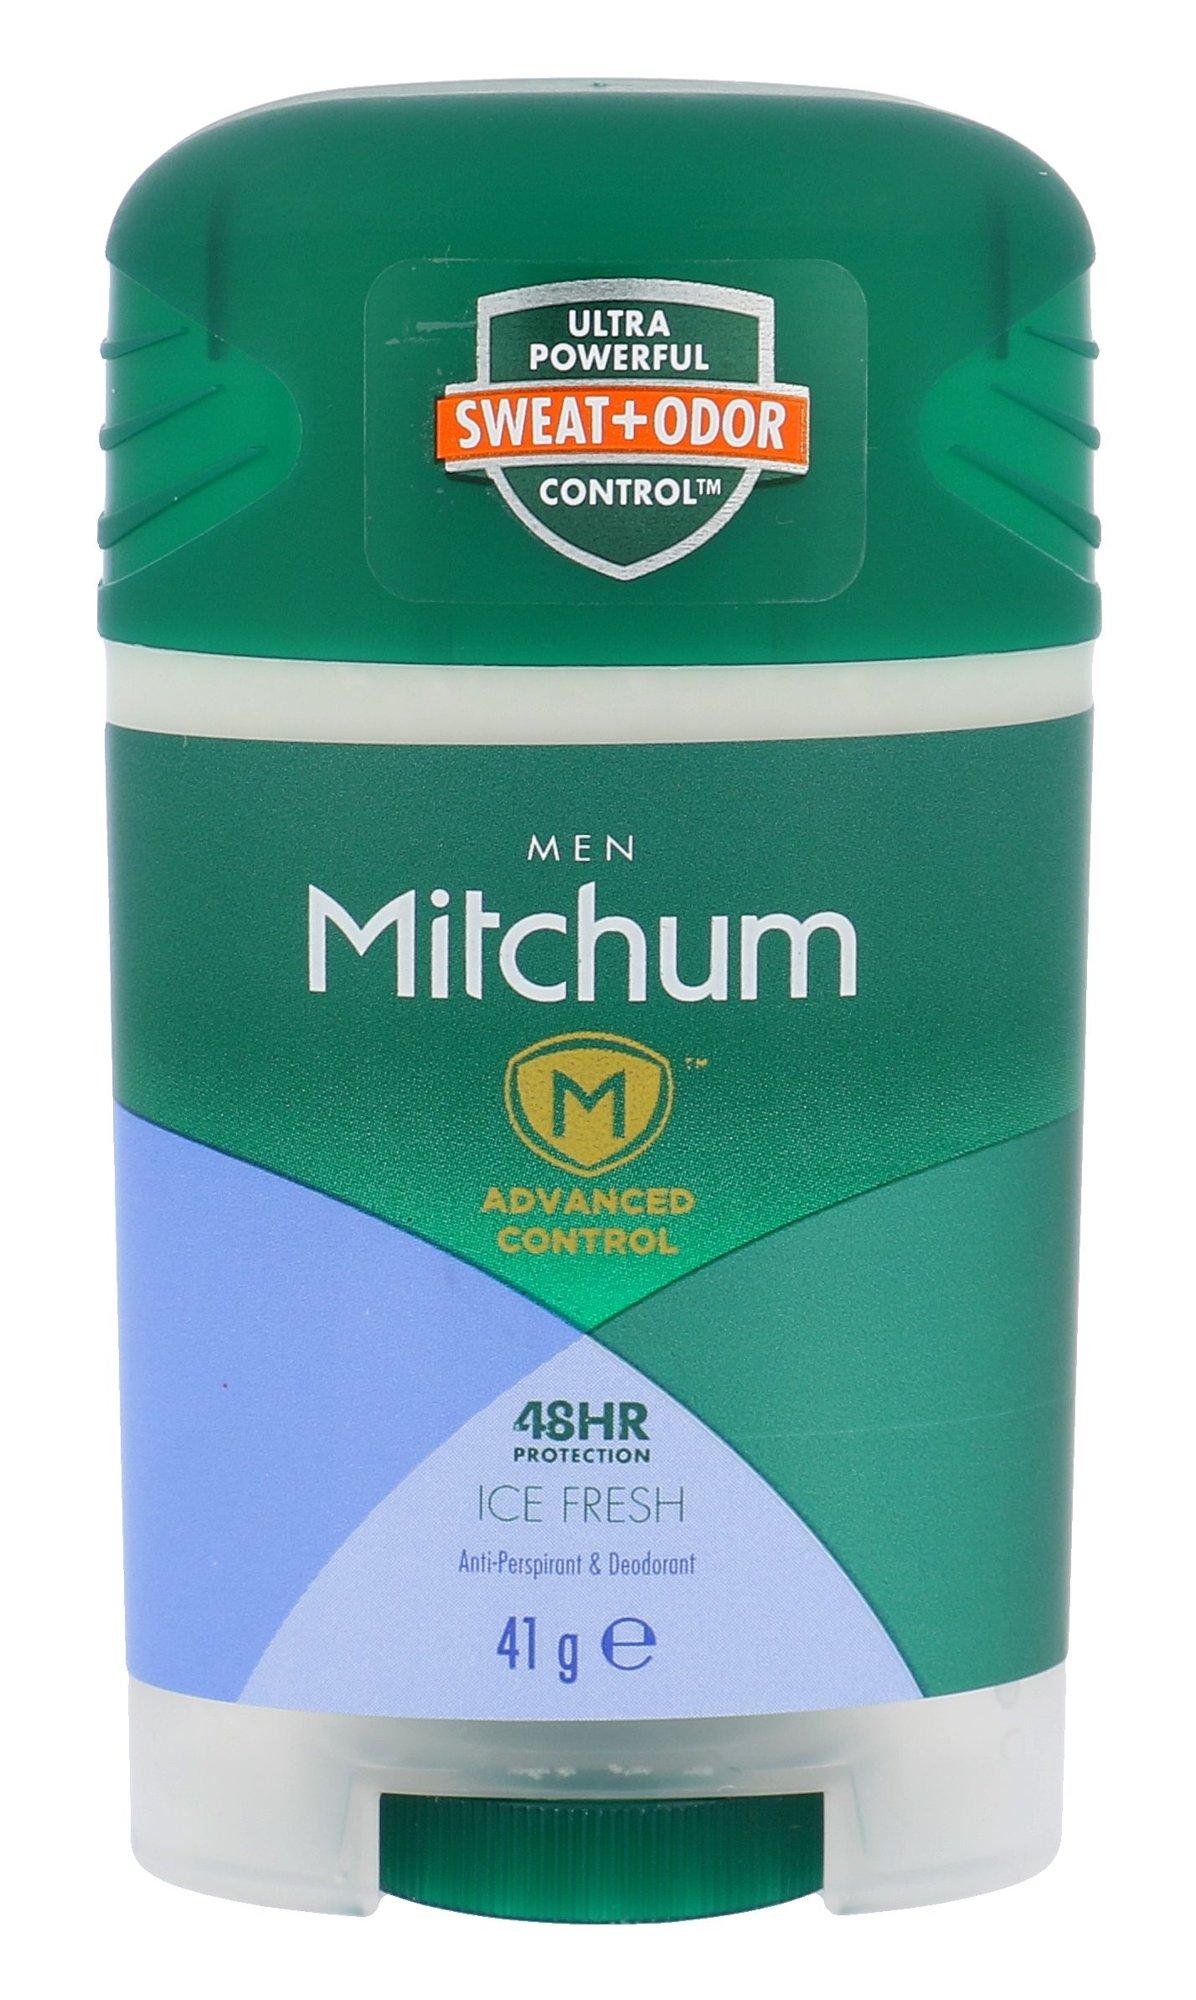 Mitchum Ice Fresh Anti-Perspirant Deostick 48HR Cosmetic 41g